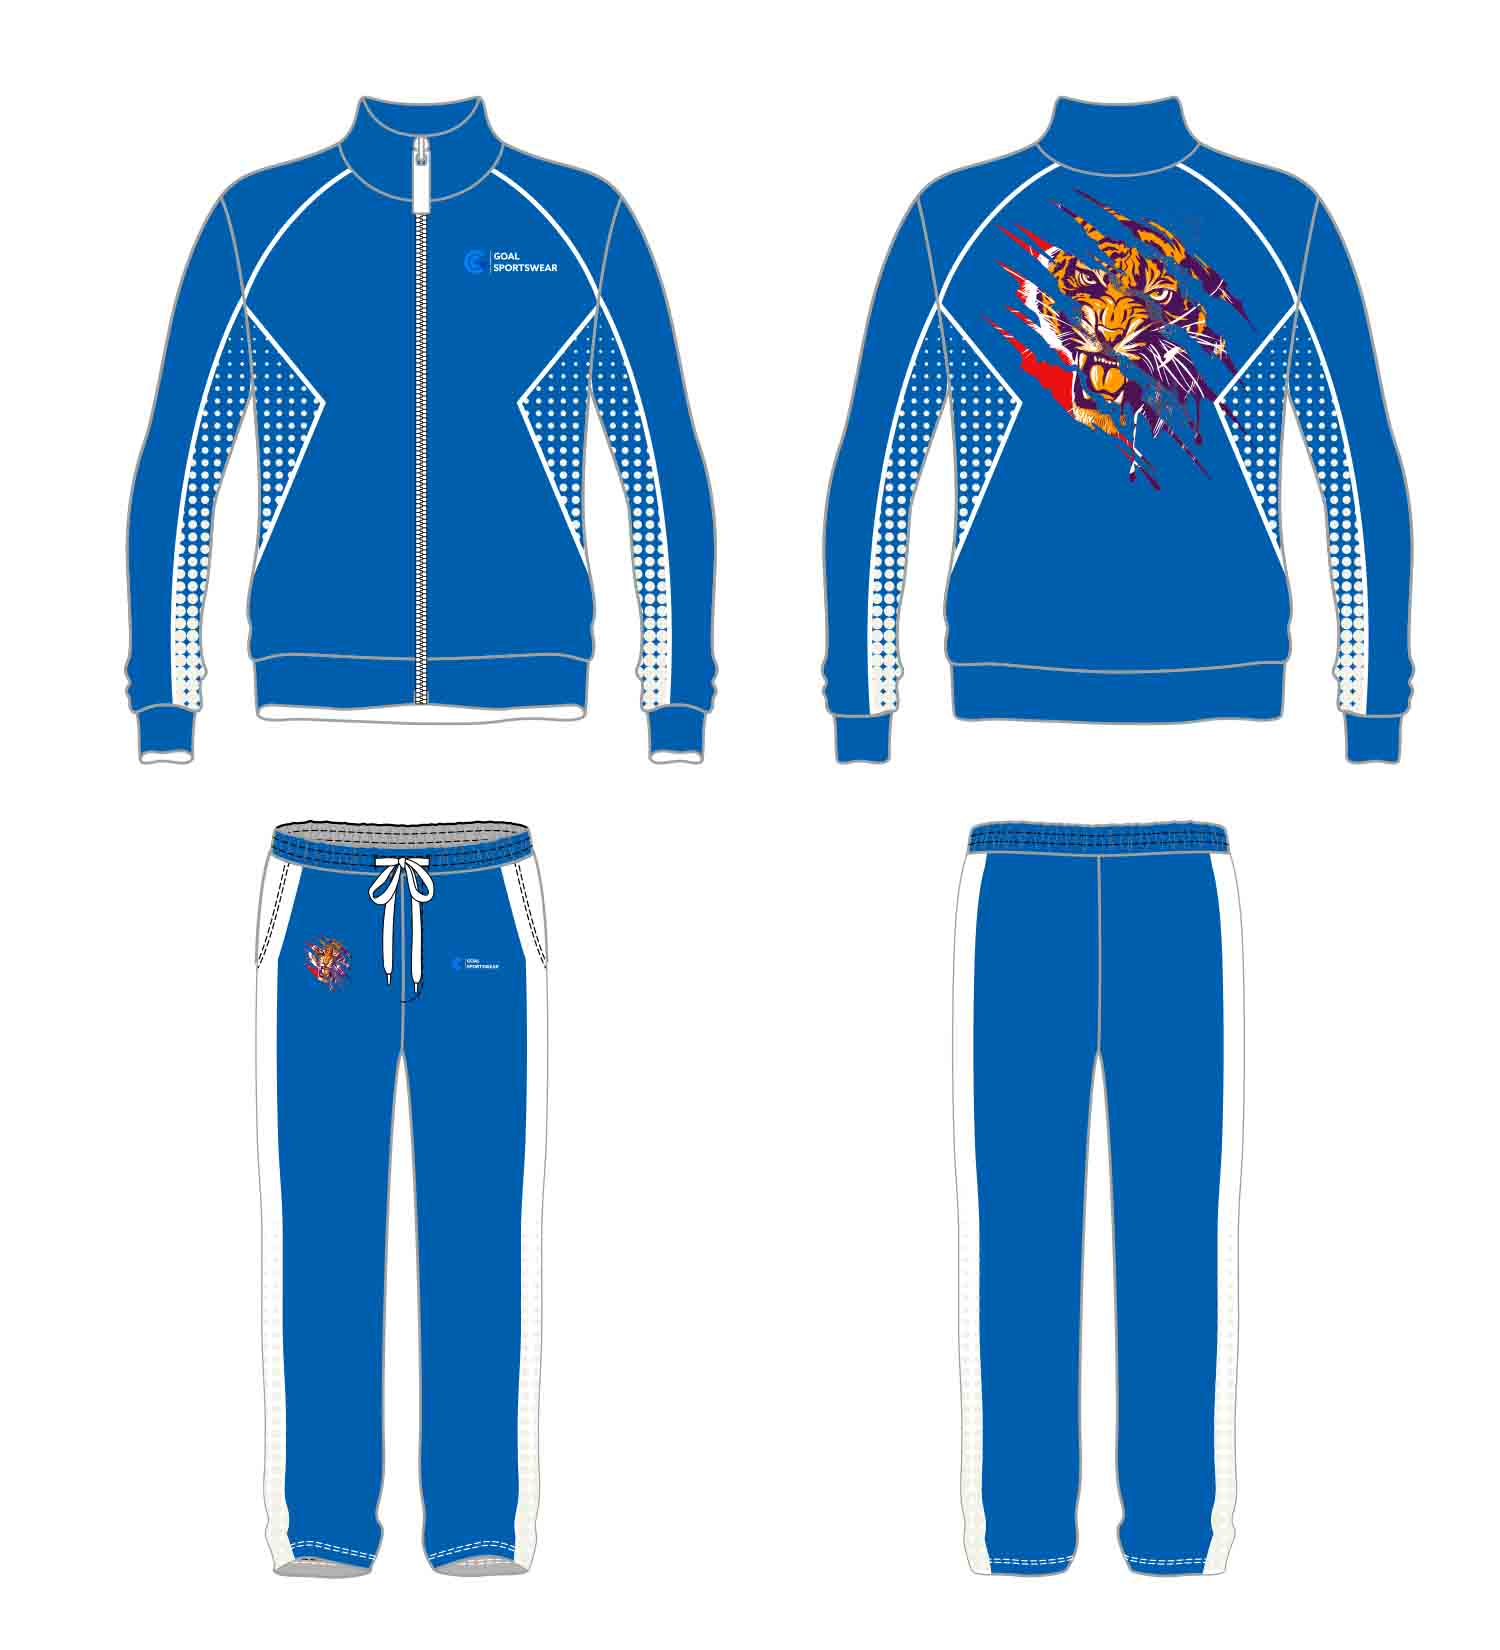 Full-polyester-durable-sublimated-custom-youth-team-custom-soccer-warm-ups